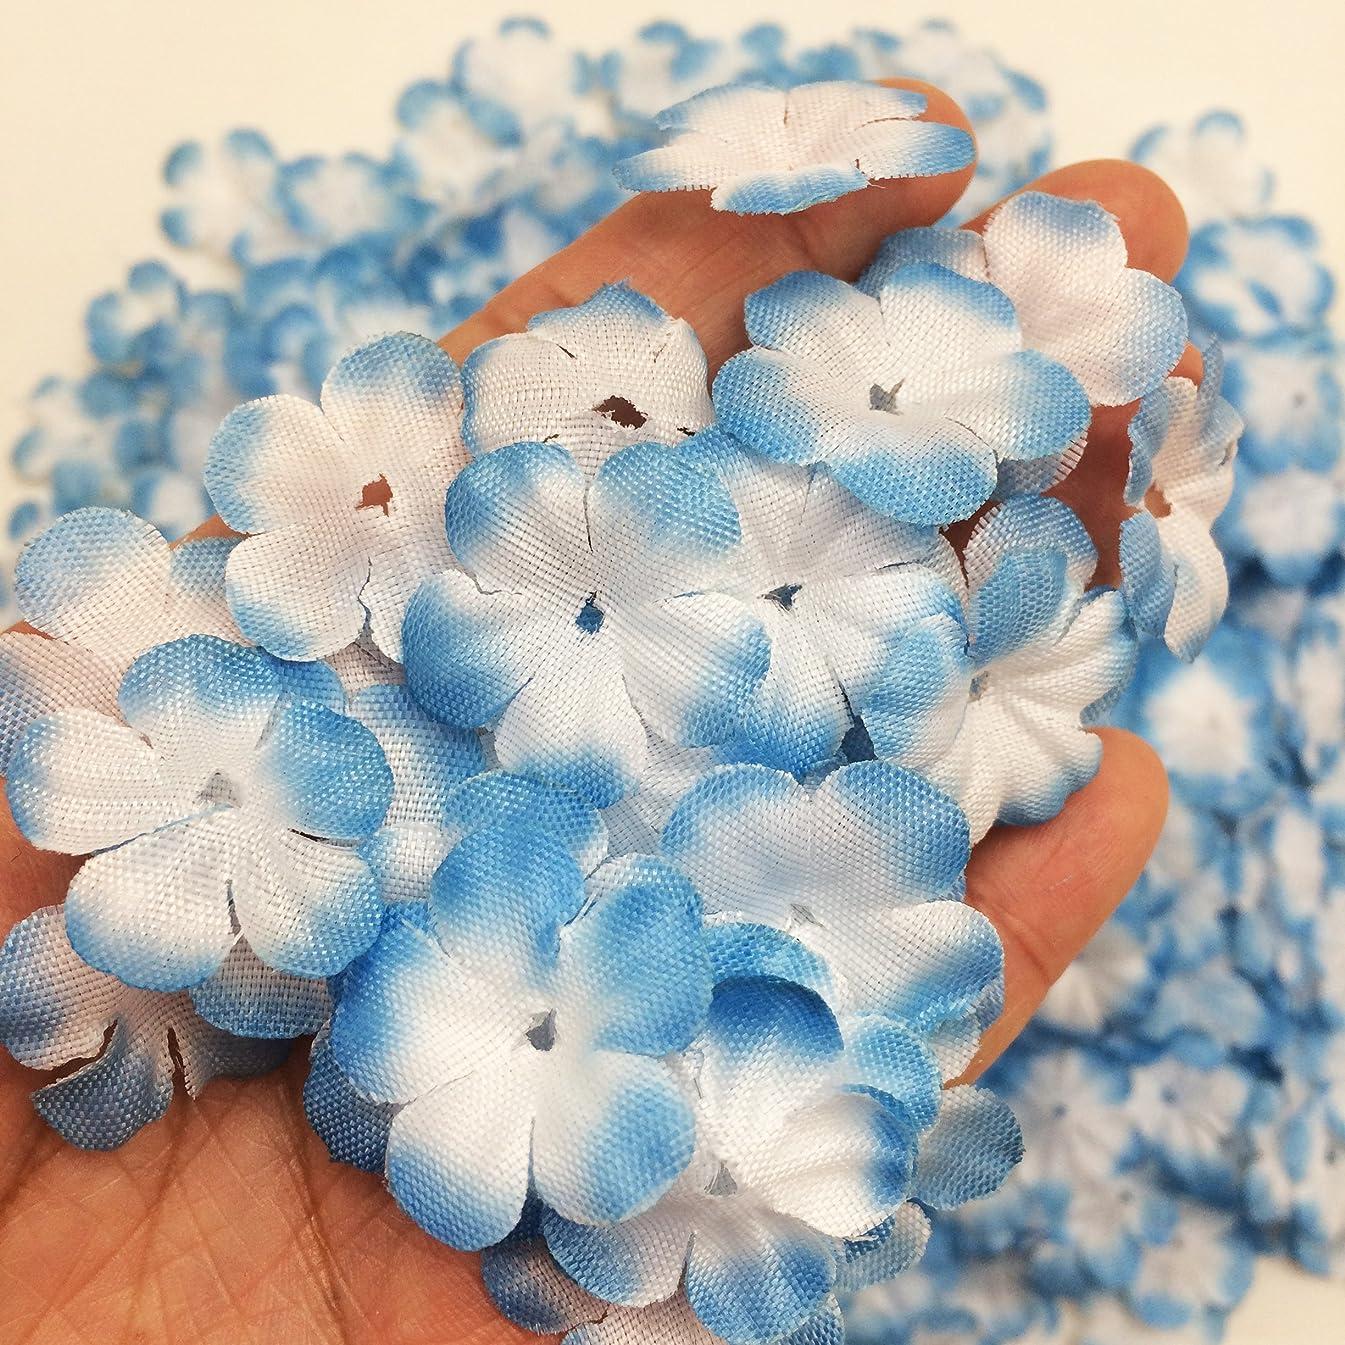 PEPPERLONELY Brand Blue Fabric Flower 5 Petals, 1 OZ Approx.750~800PC Flower Petals, 25mm (1Inch)